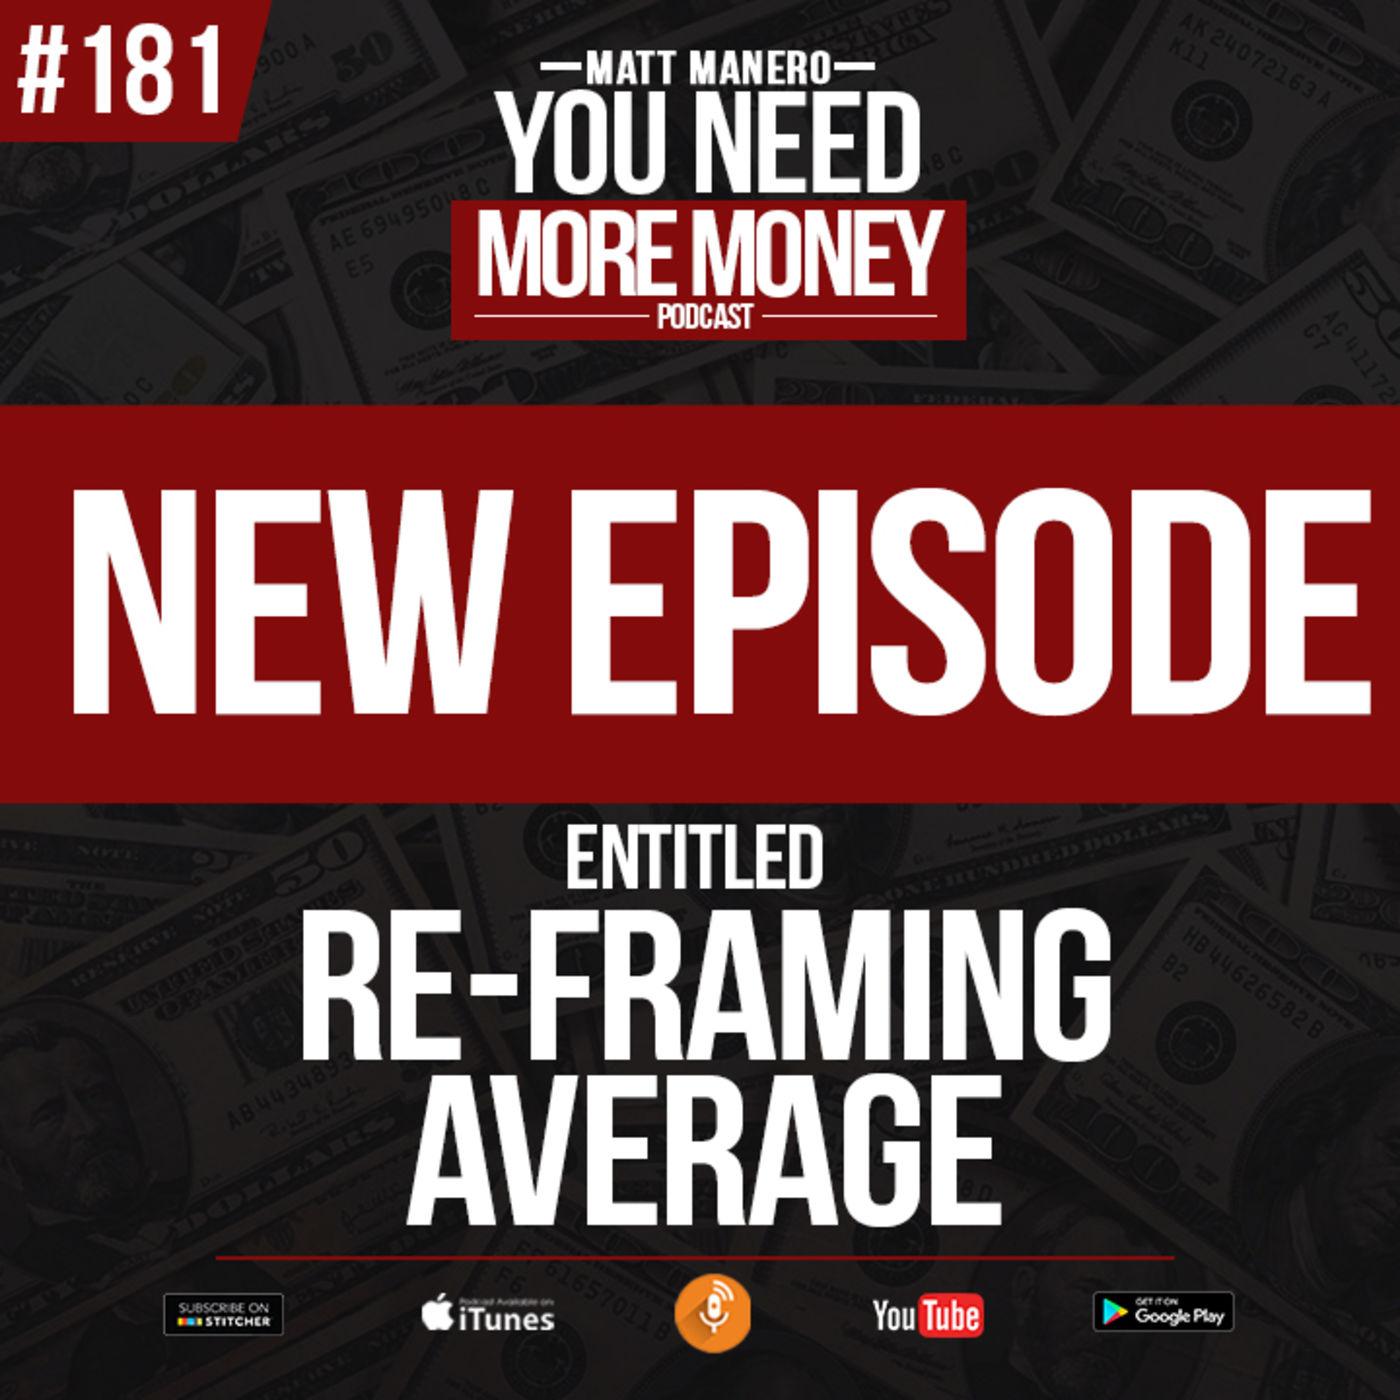 #181 RE-FRAMING AVERAGE with host Matt Manero